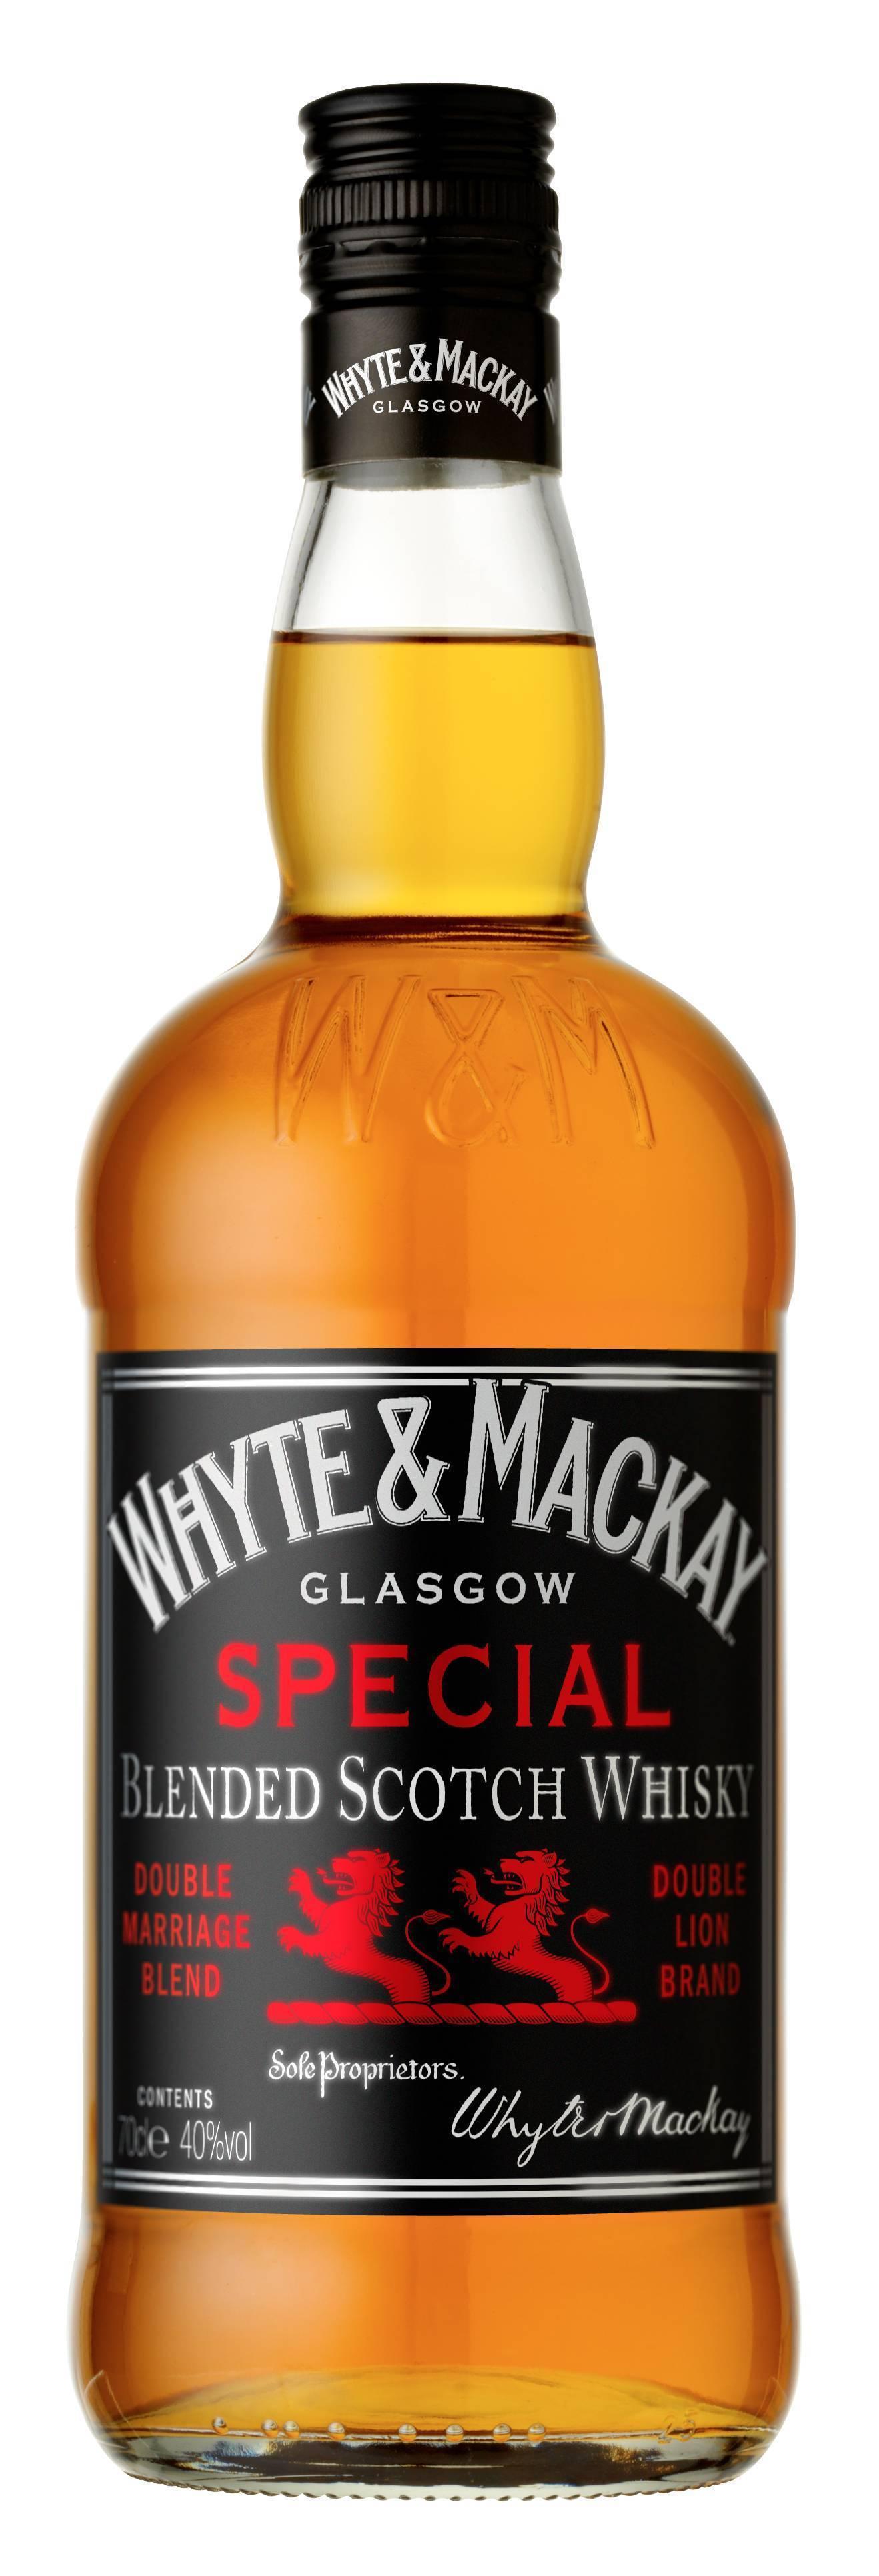 Виски whyte and mackay special (уайт энд маккей спешиал) и его особенности